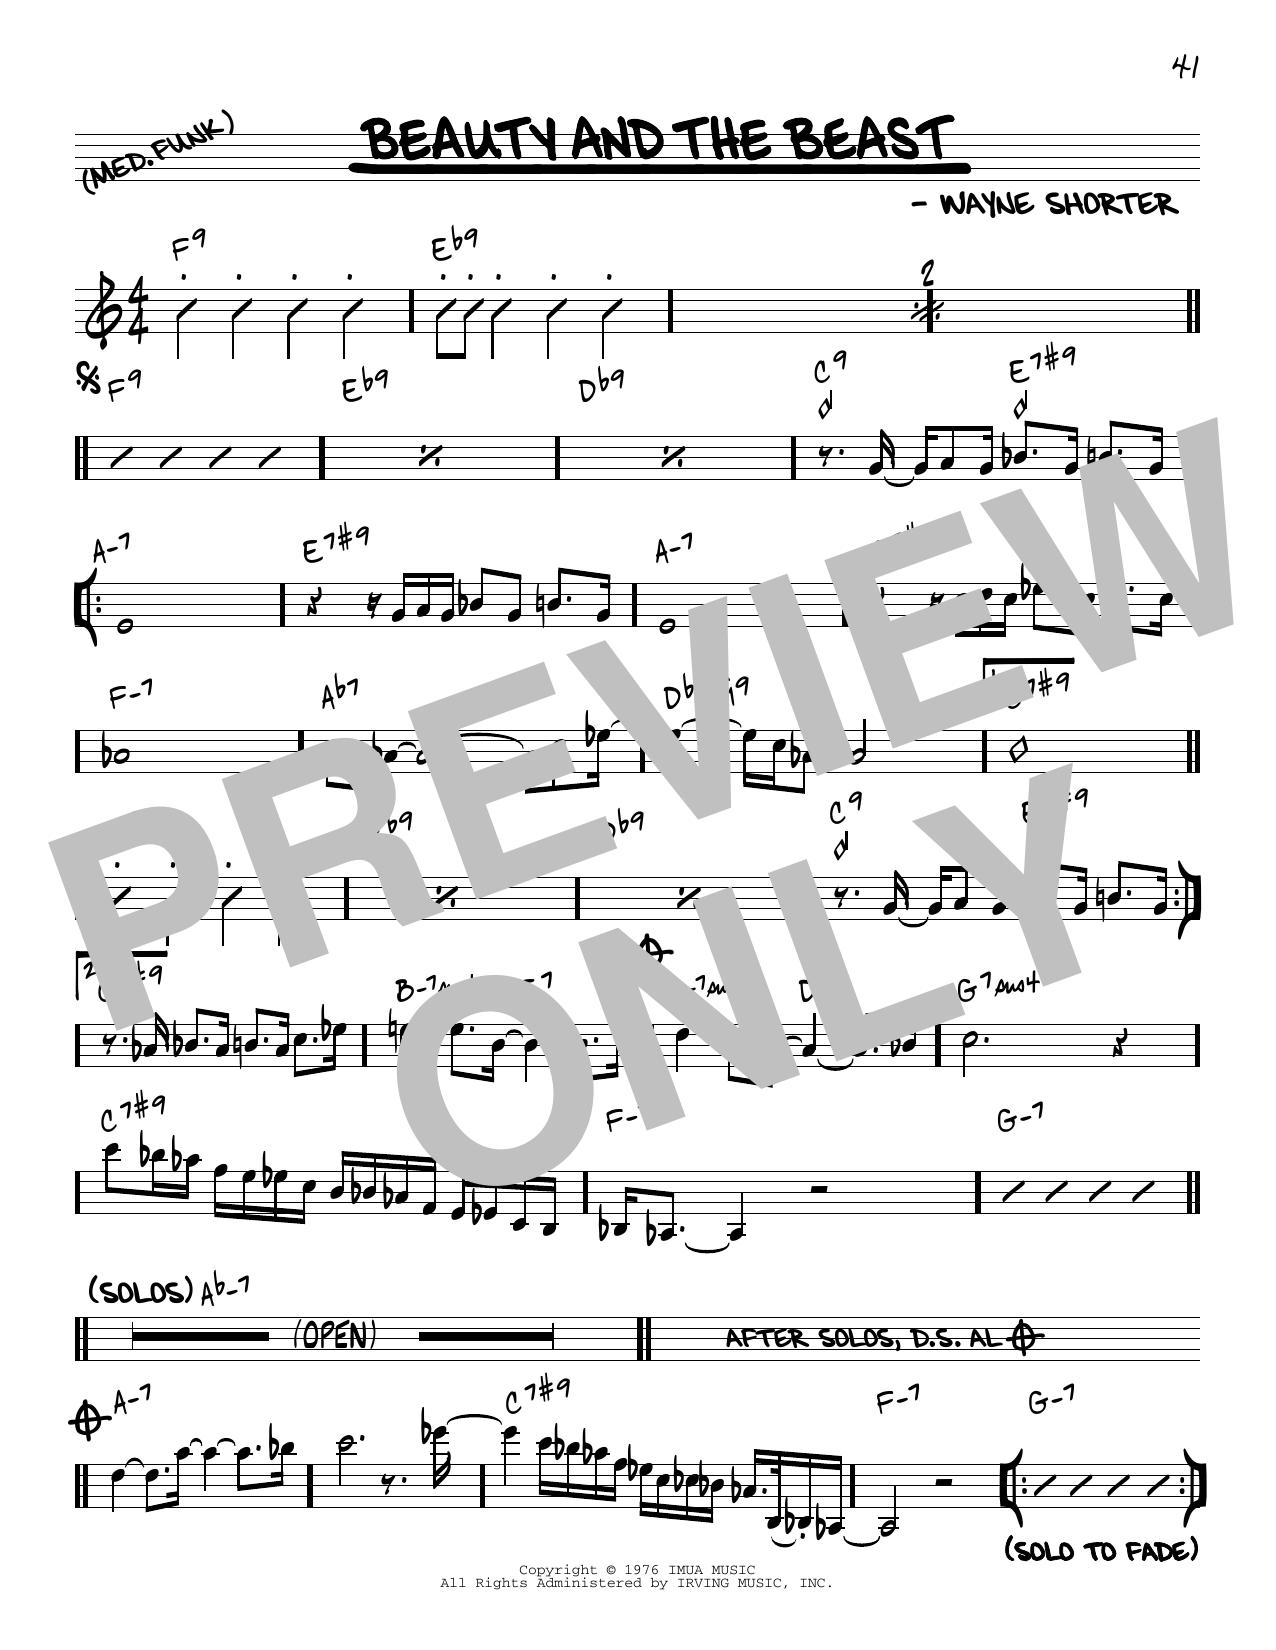 Wayne Shorter Beauty And The Beast [Reharmonized version] (arr. Jack Grassel) sheet music notes printable PDF score